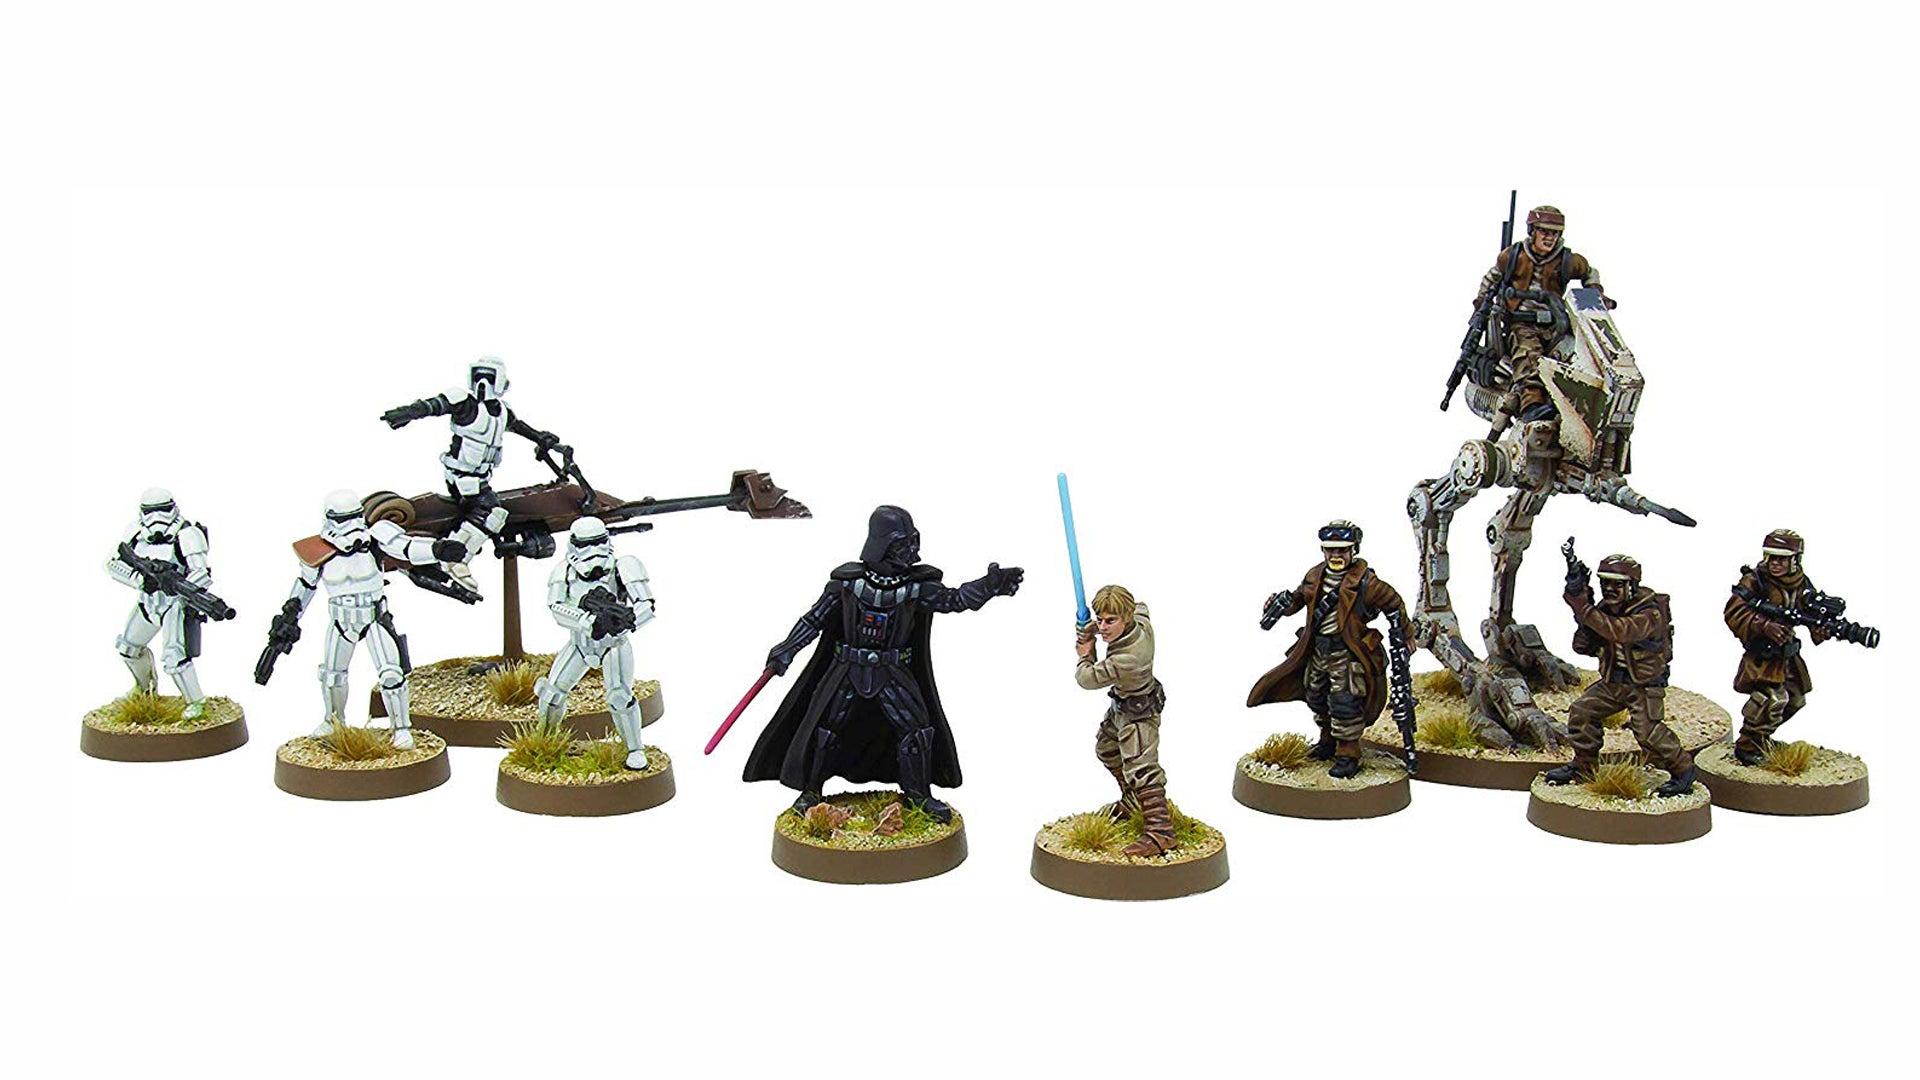 Star Wars: Legion miniatures game pieces